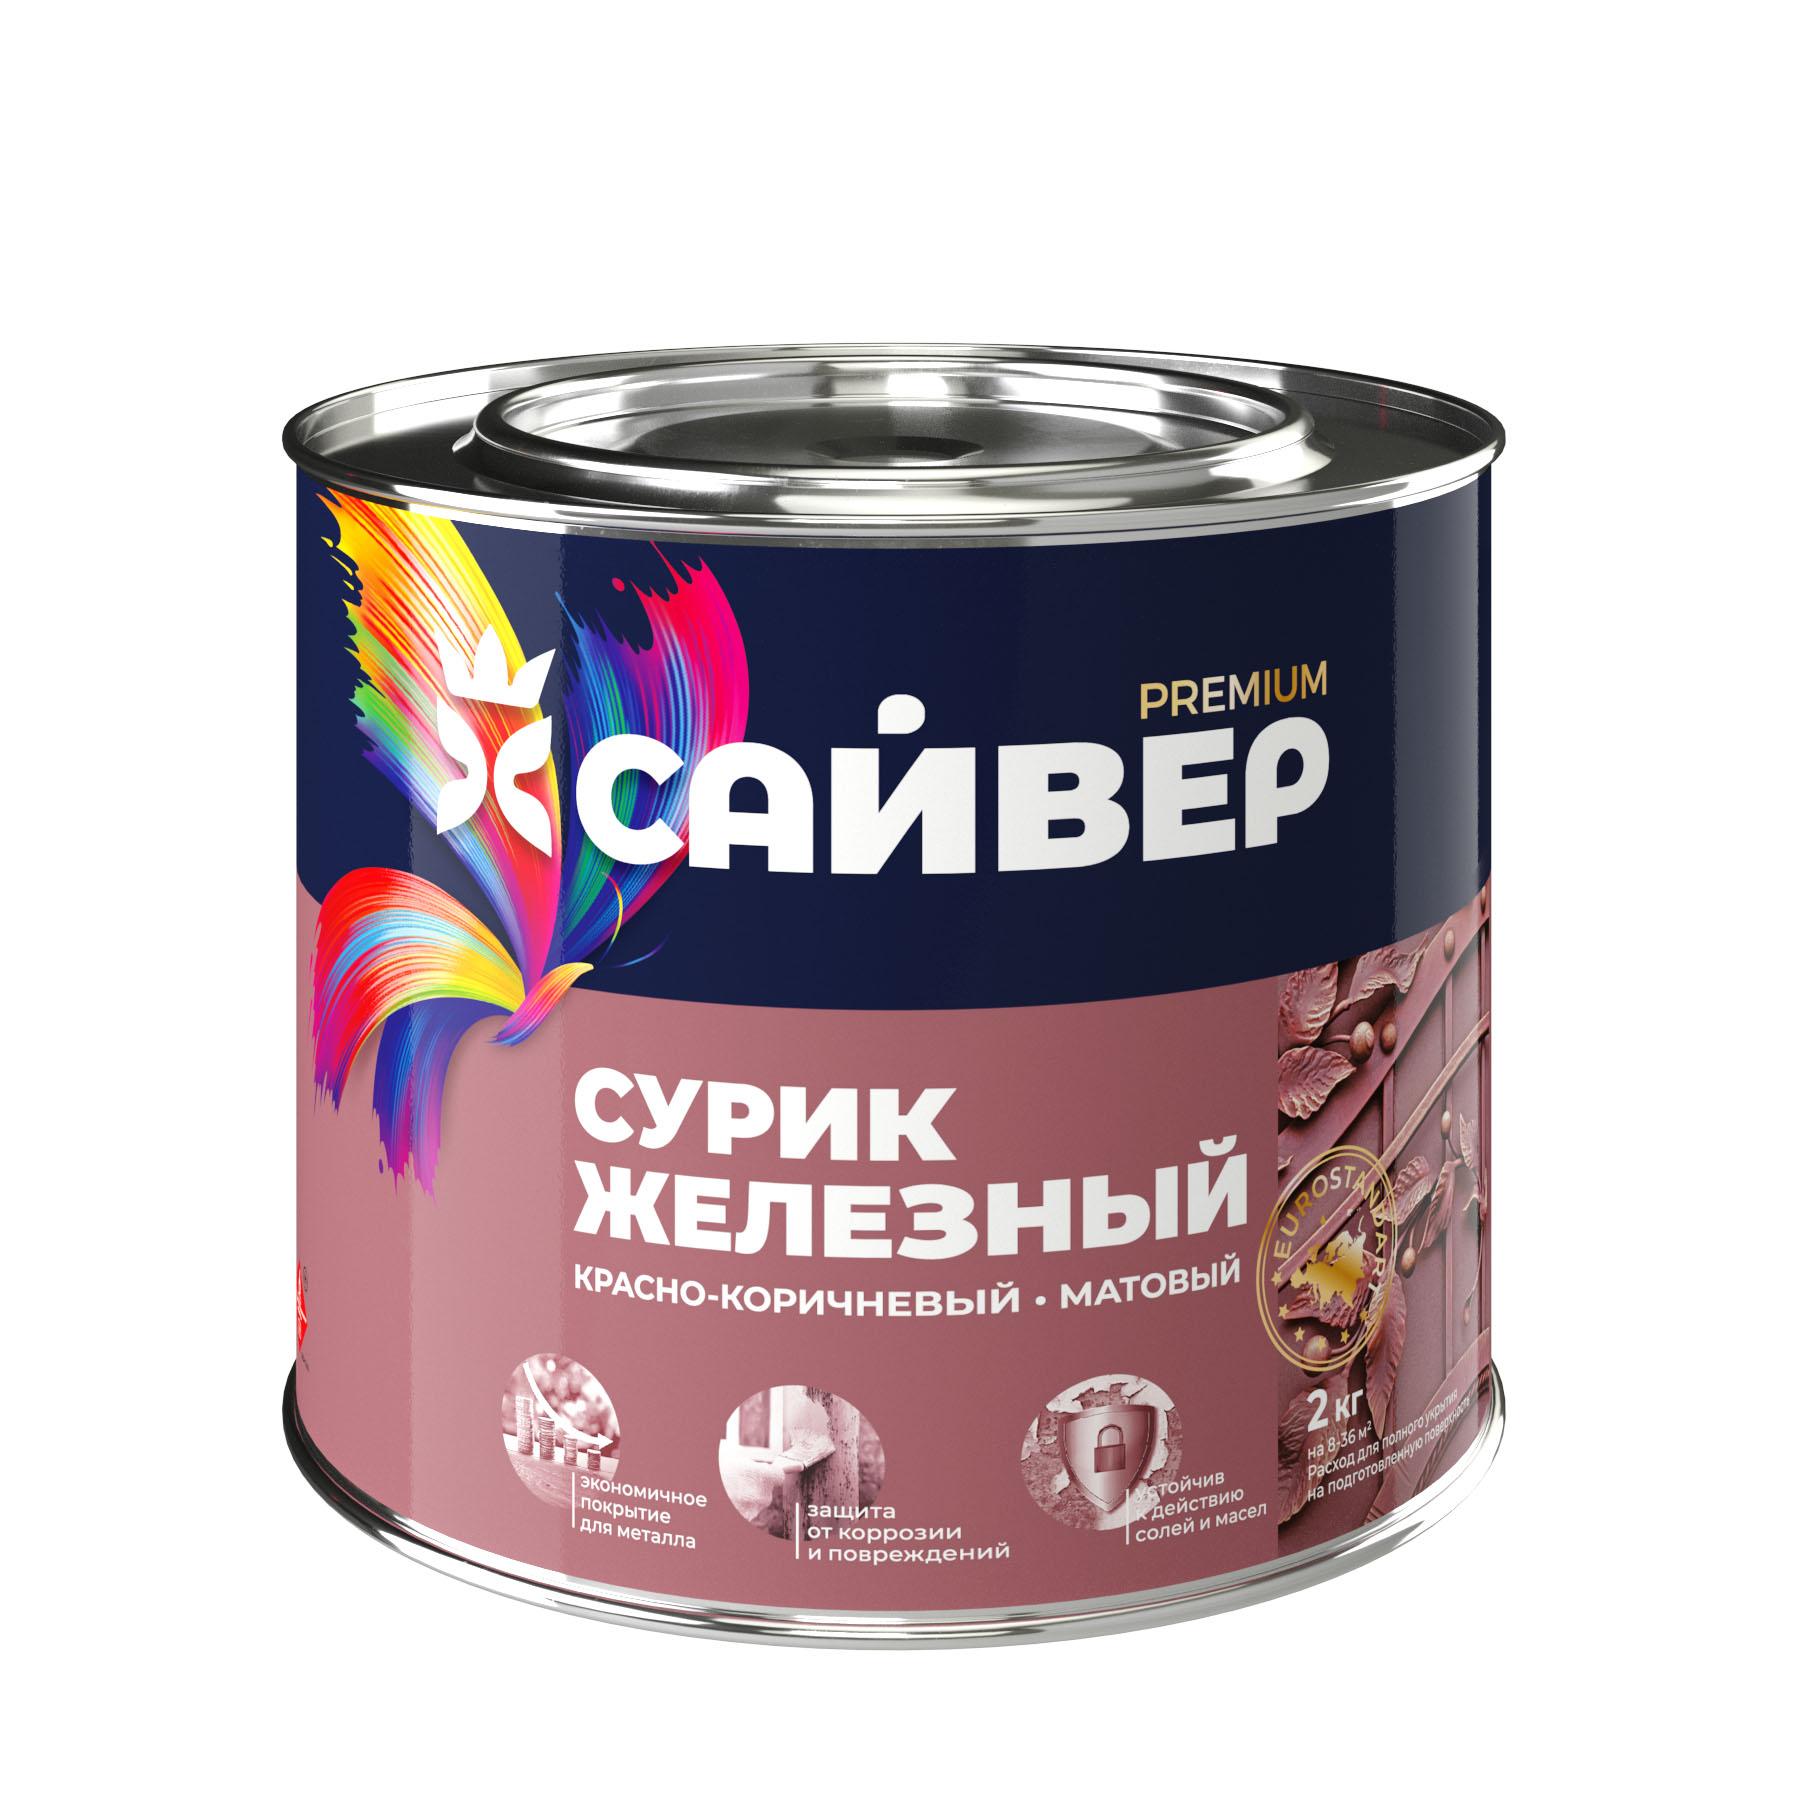 Сурик железный алкидный Сайвер 1.0 кг - фото